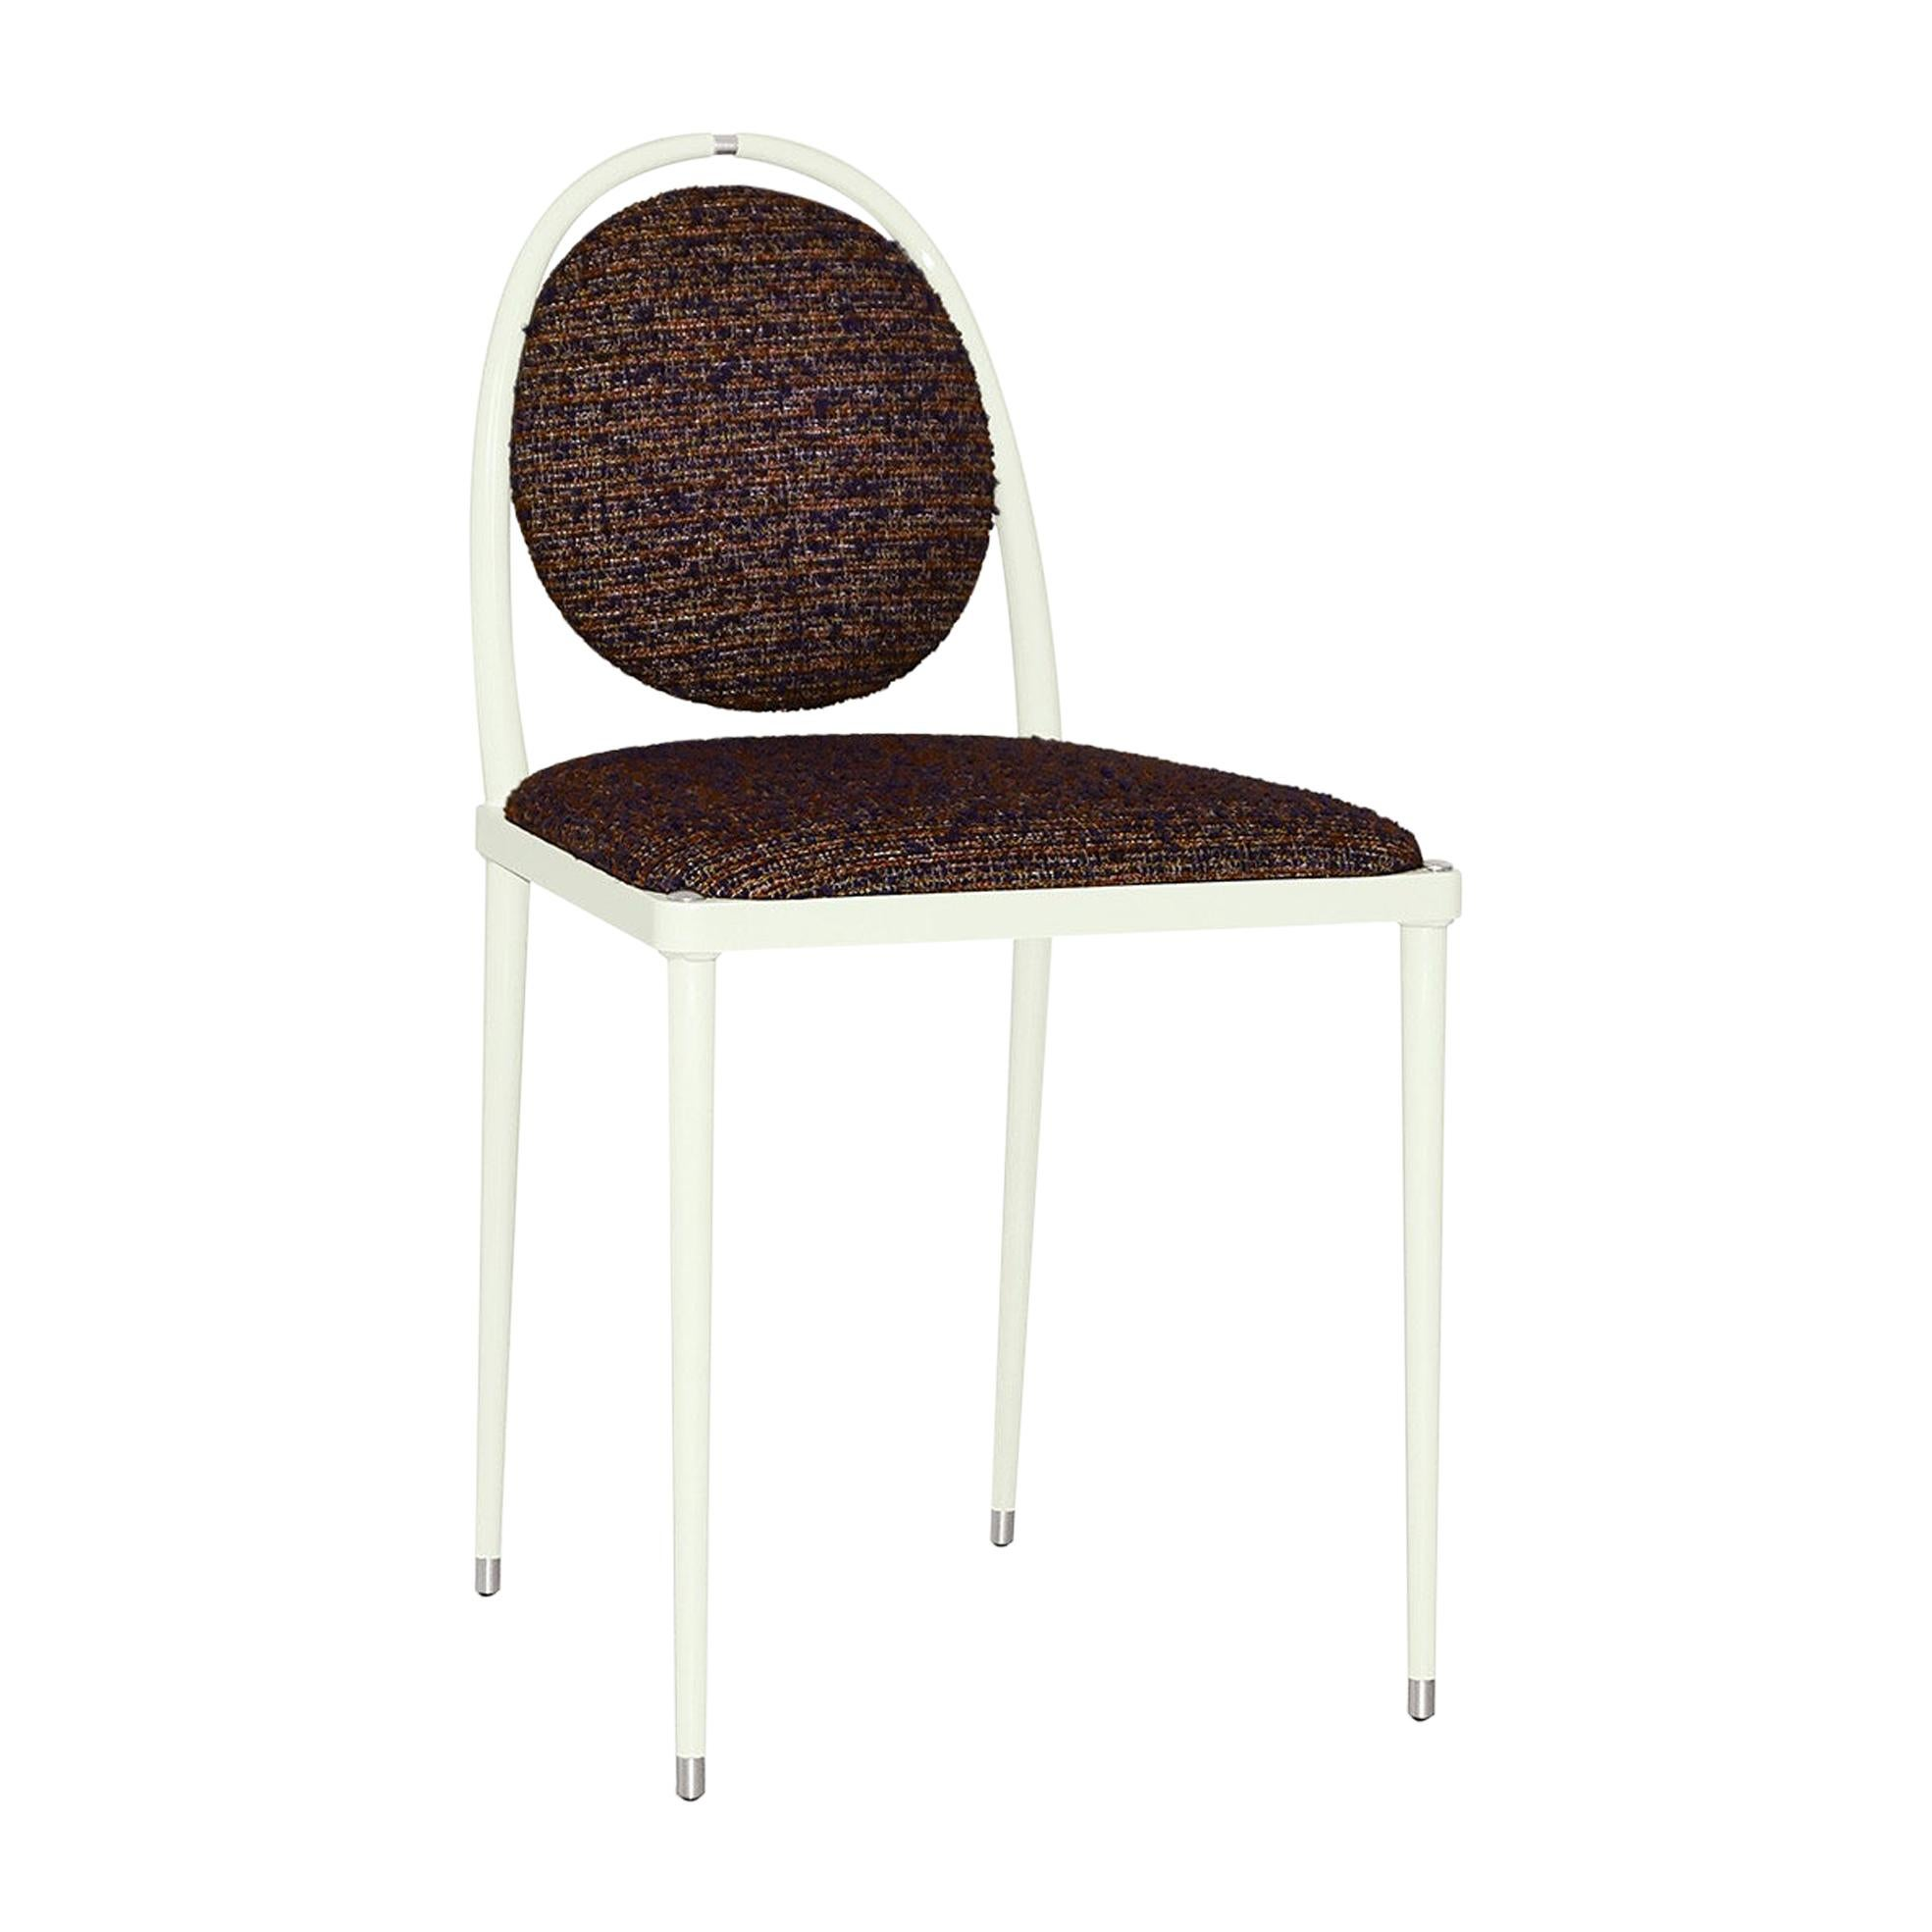 'Balzaretti' Chair in Colorful Textured Fabric, Alpaca, Wool and Mohair